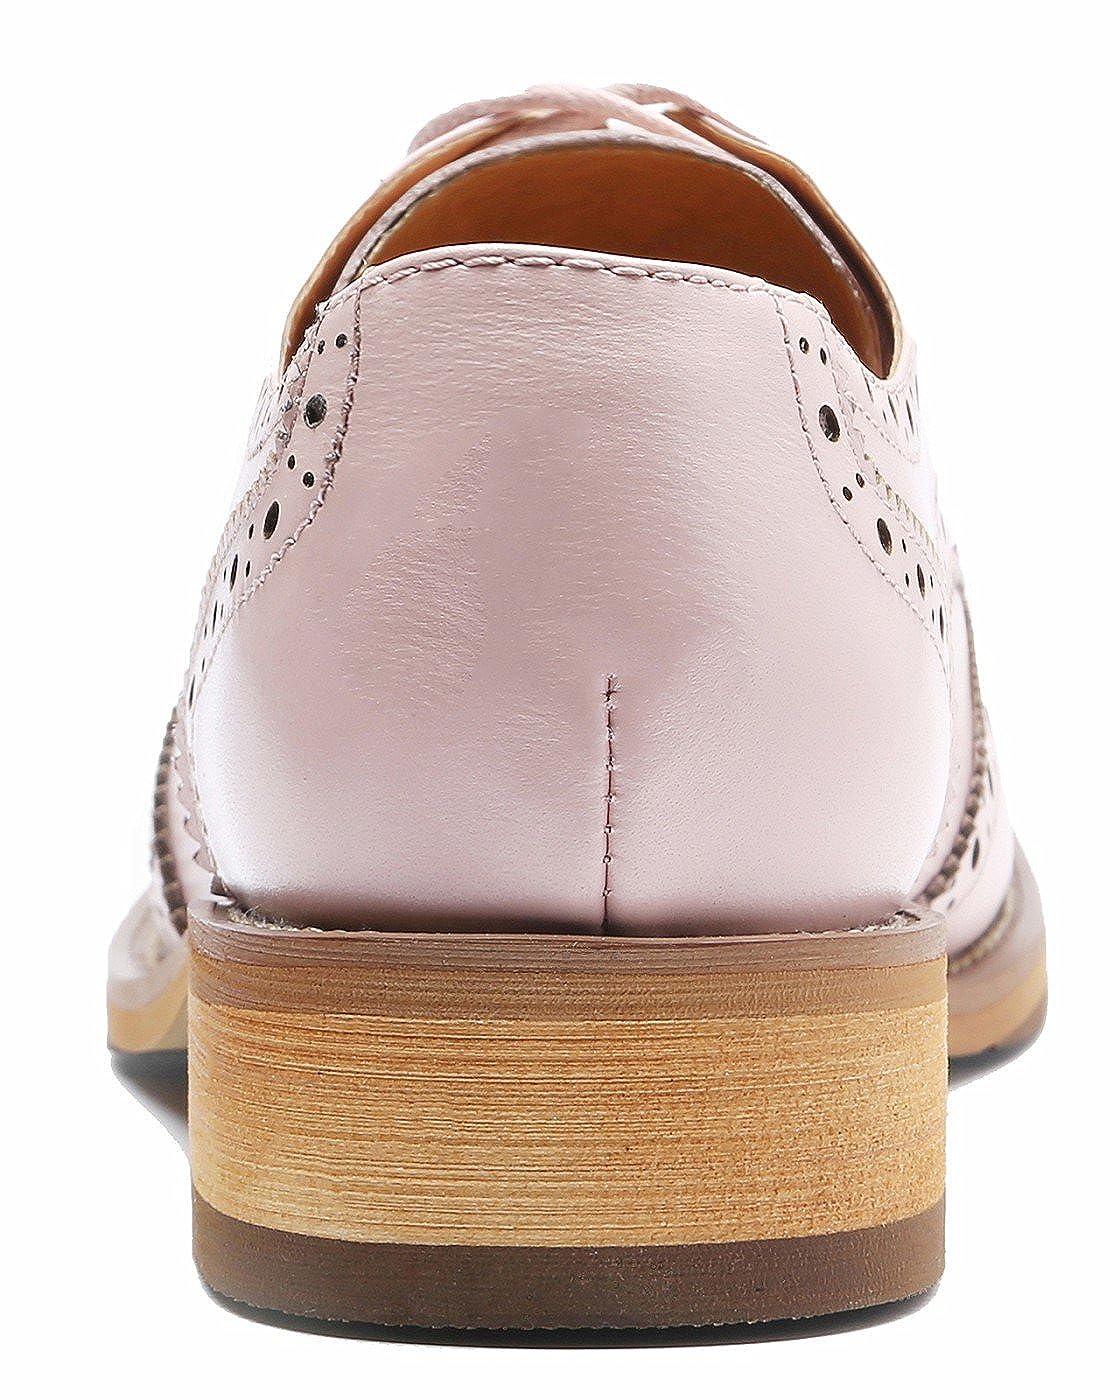 SimpleC Damen Vintage Brogue Brogue Brogue Bequem Business&Schnürhalbschuhe Leder Klassiker Perforierte Wingtip Oxfords fa9d85